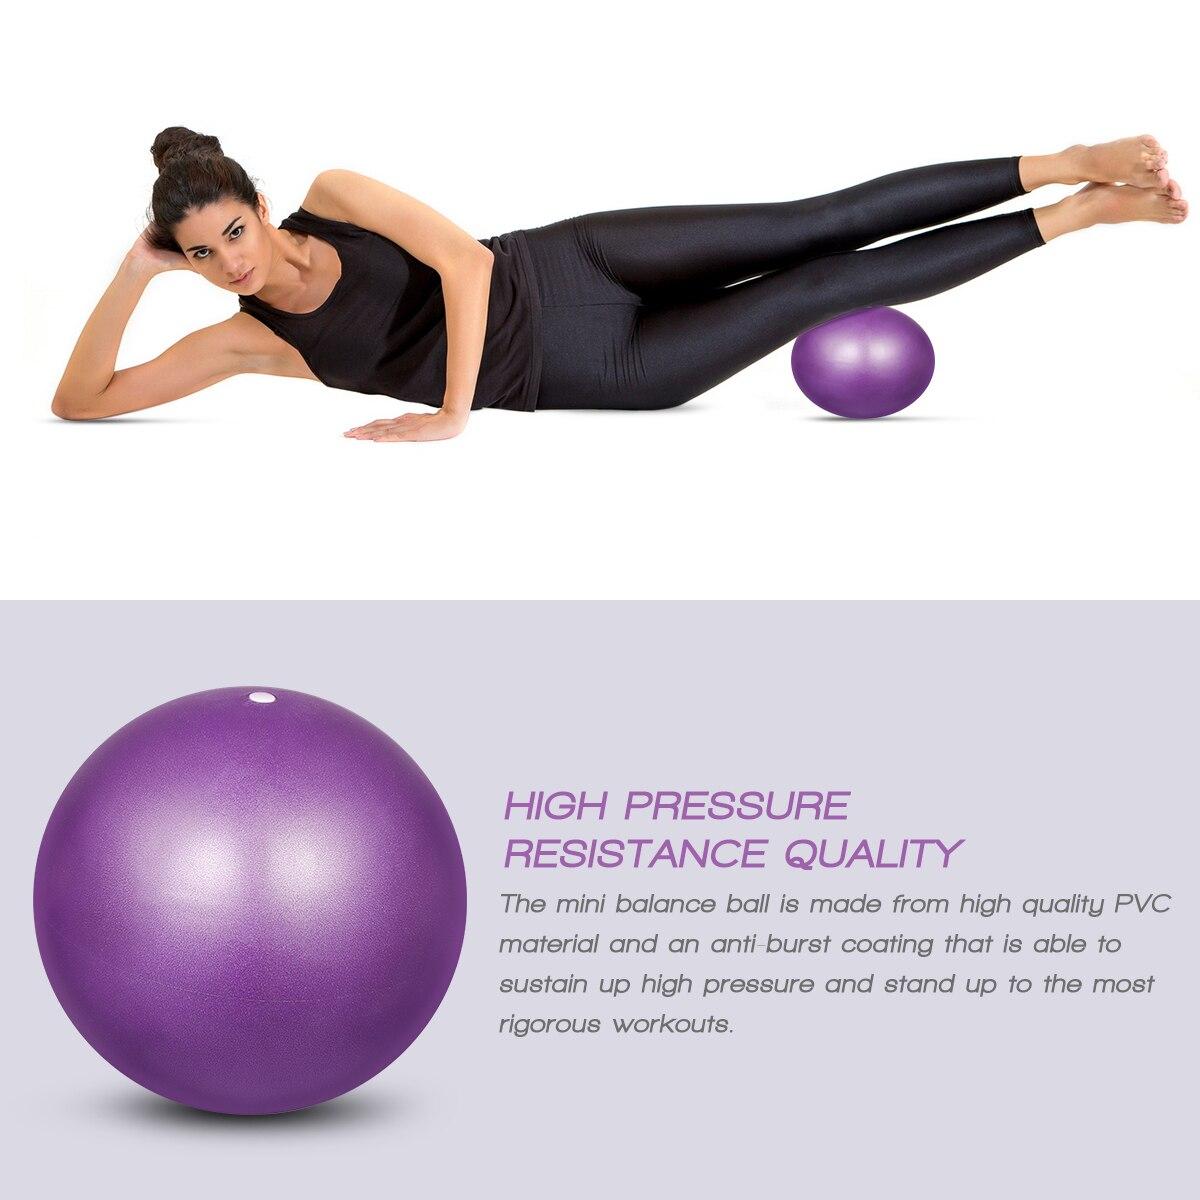 Vorcool yoga pilates bola exercício ginástica fitness pilates bola equilíbrio ginásio fitness yoga núcleo bola treinamento indoor yoga bolas